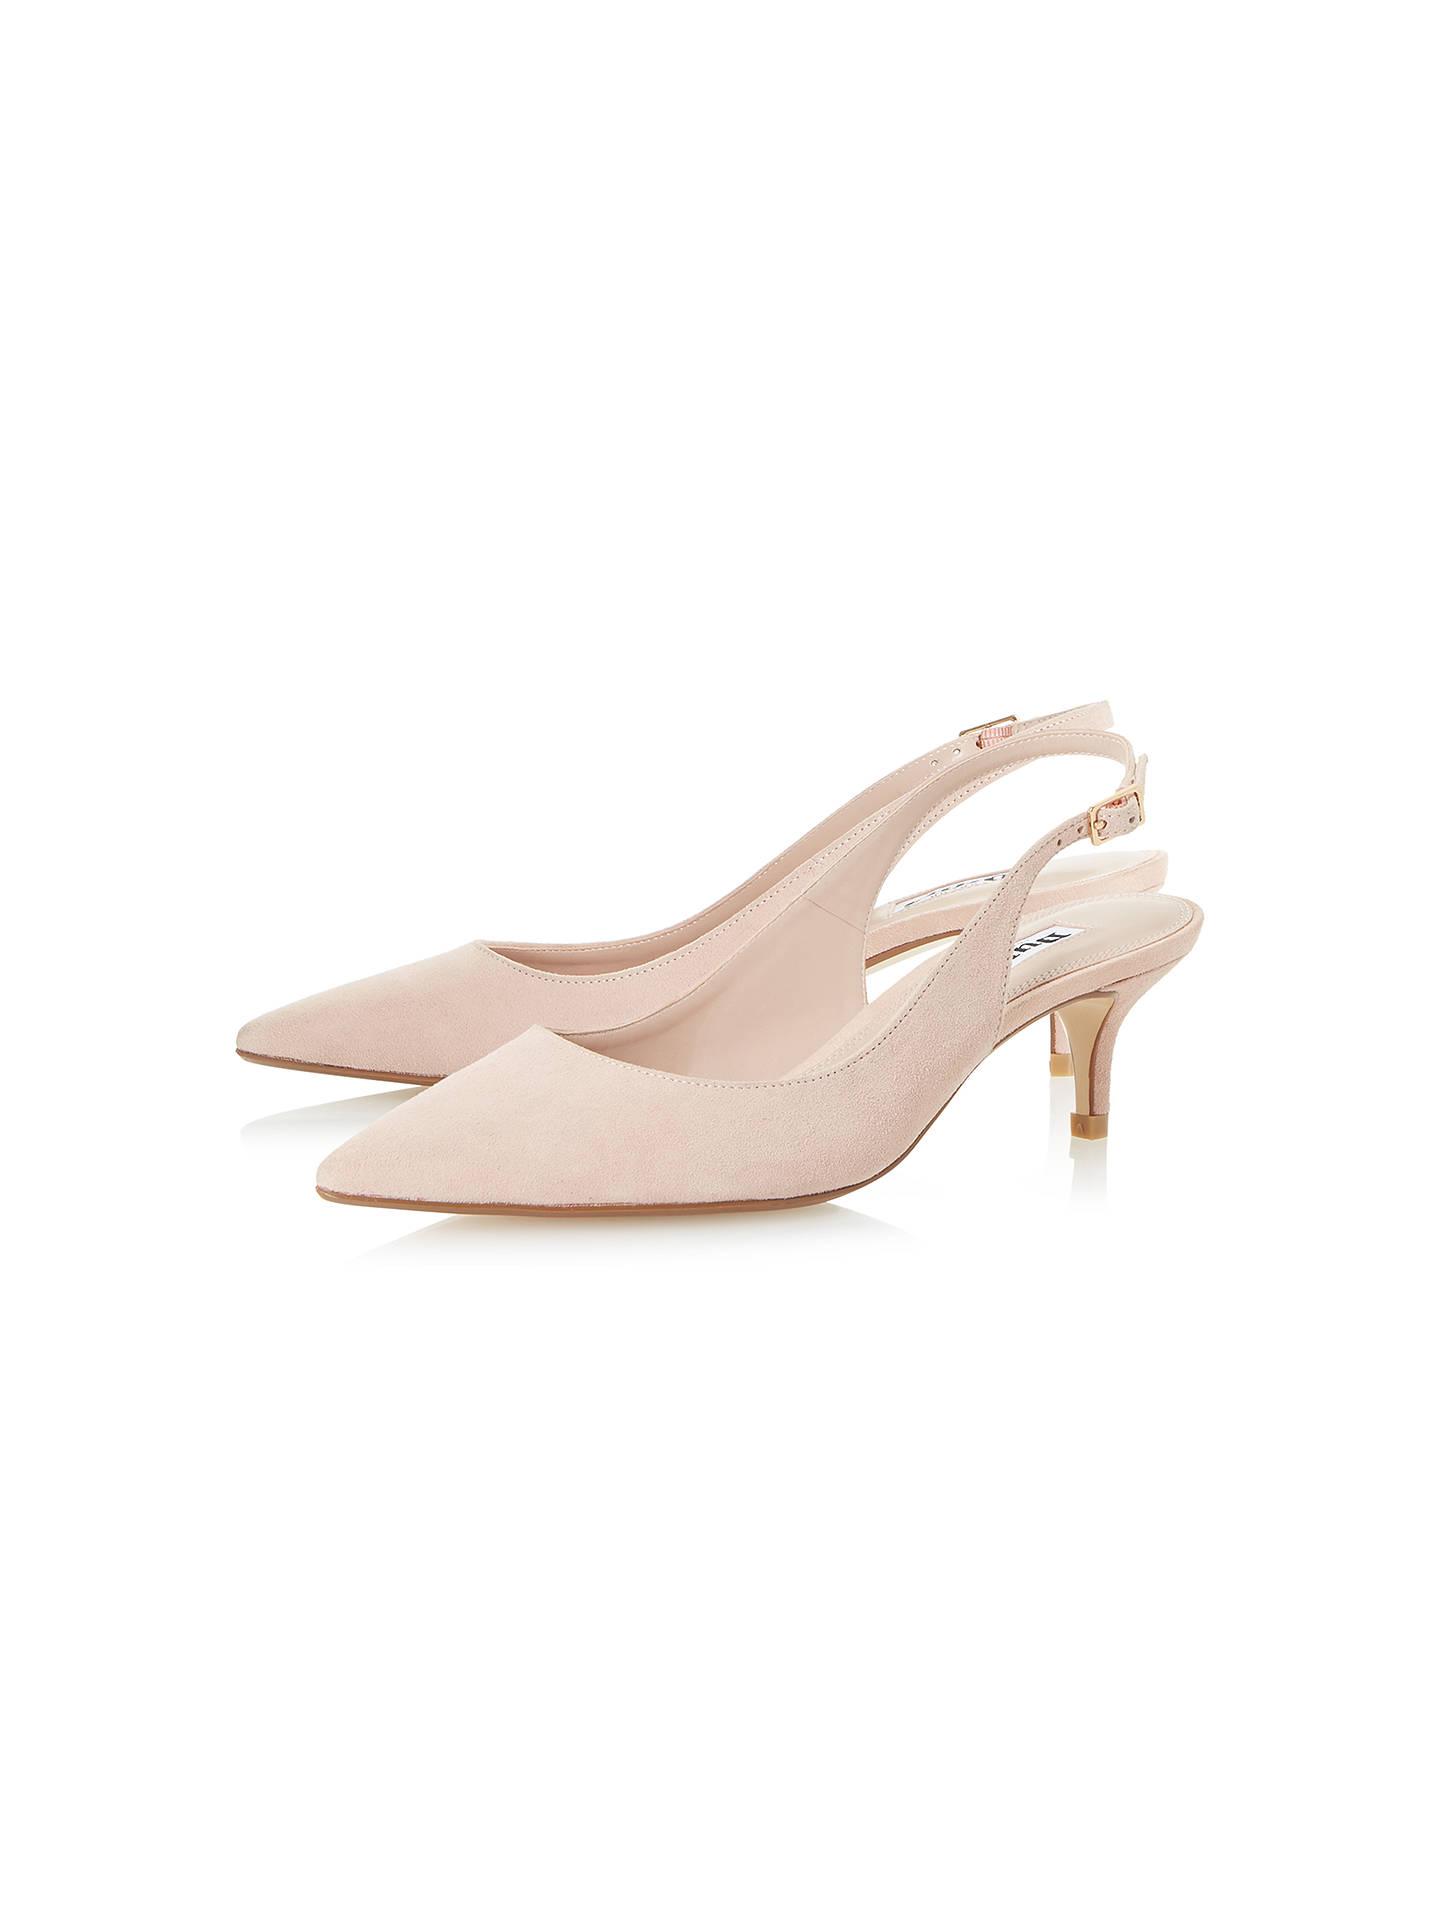 2a07368d3c7ef ... Buy Dune Casandra Kitten Heel Slingback Court Shoes